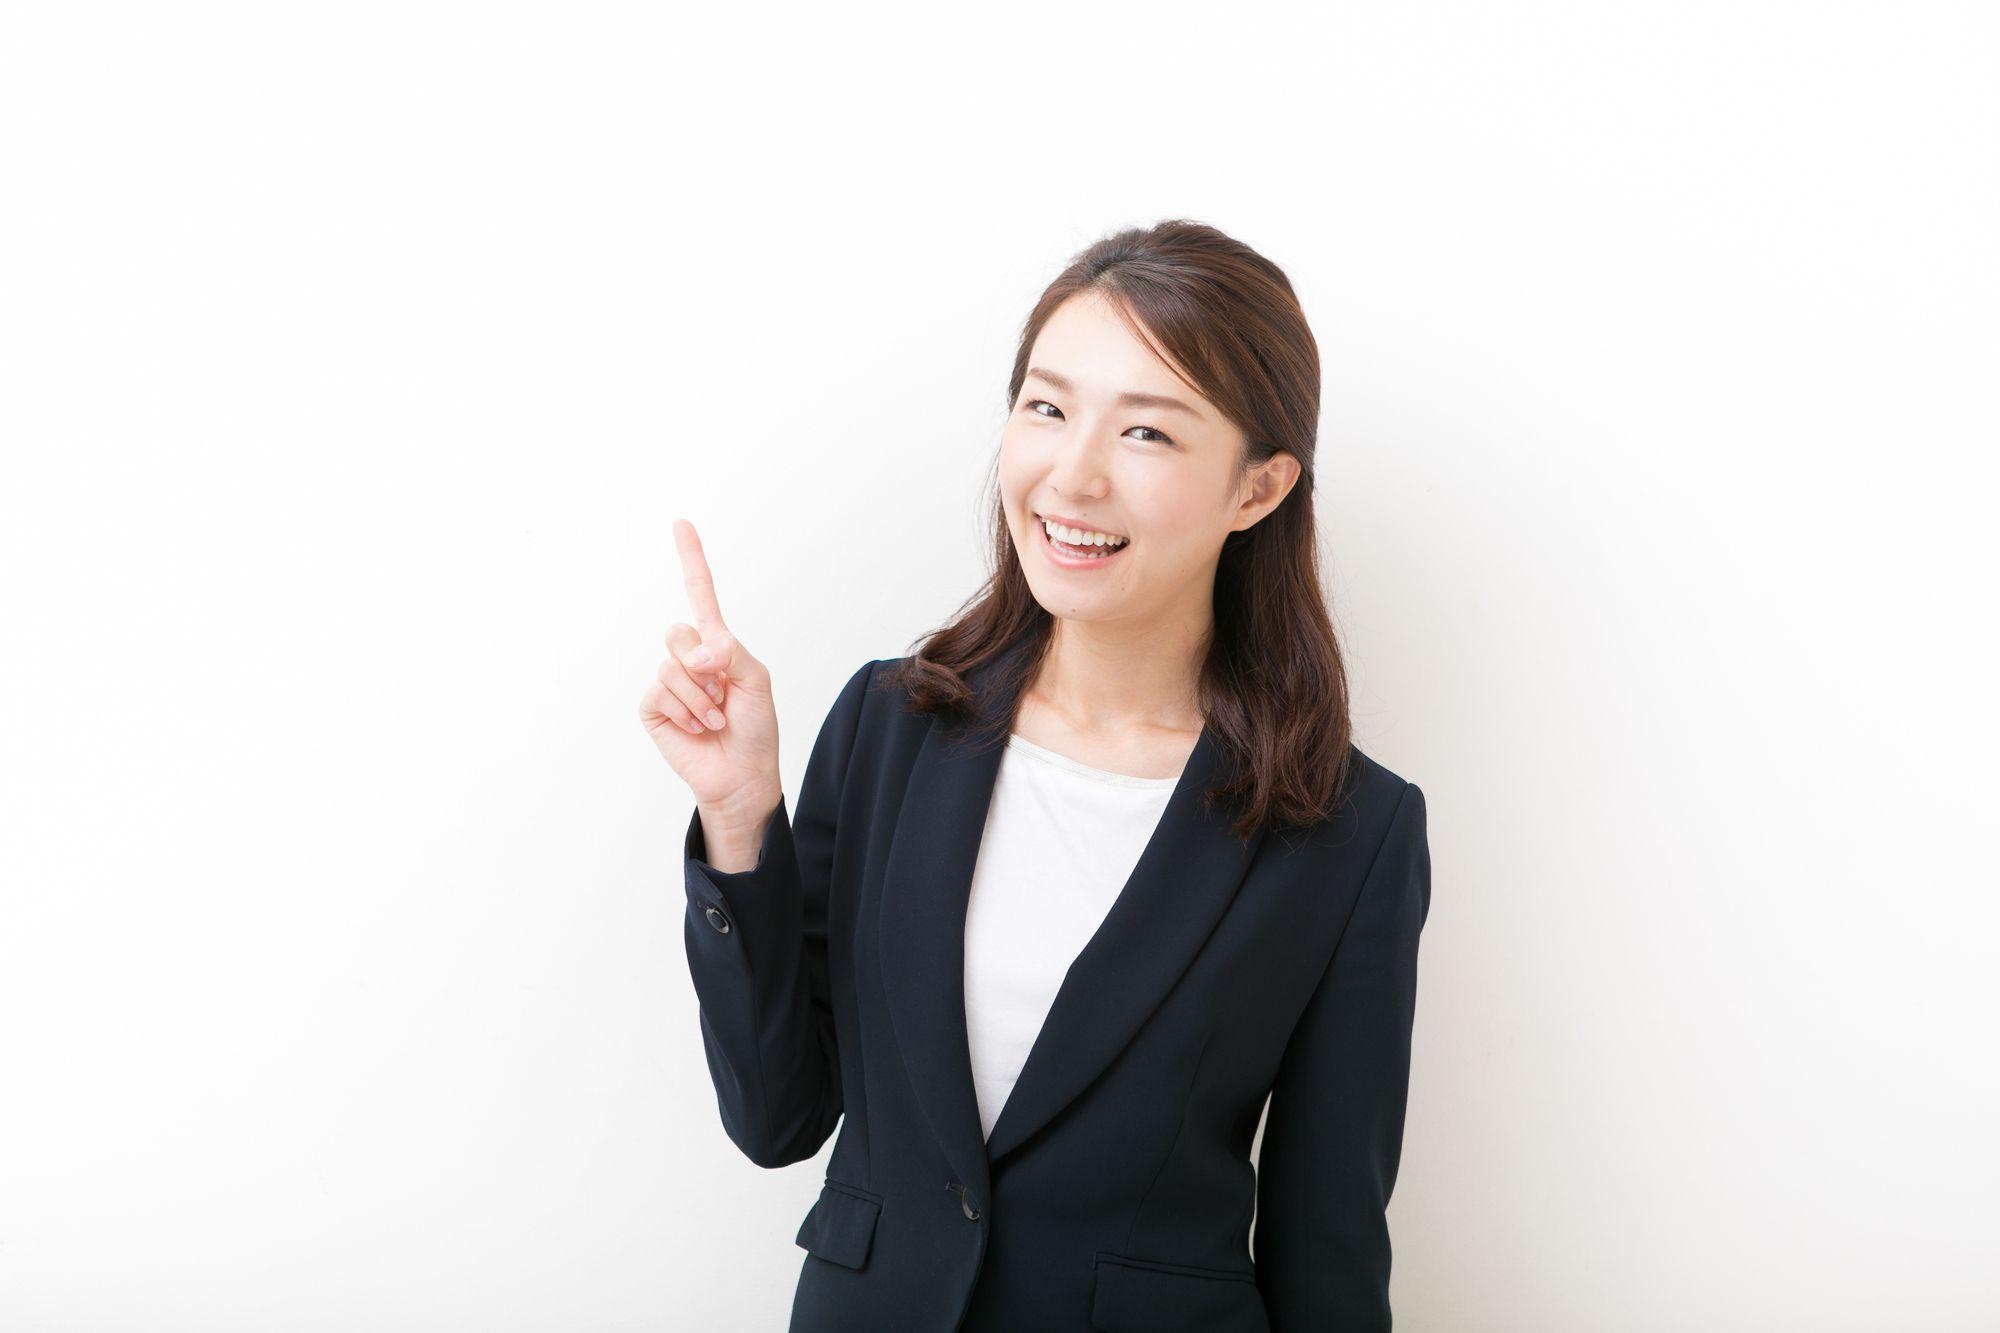 "<span class=""title"">新規事業を立ち上げるなら経営コンサルティング利用がおすすめ</span>"